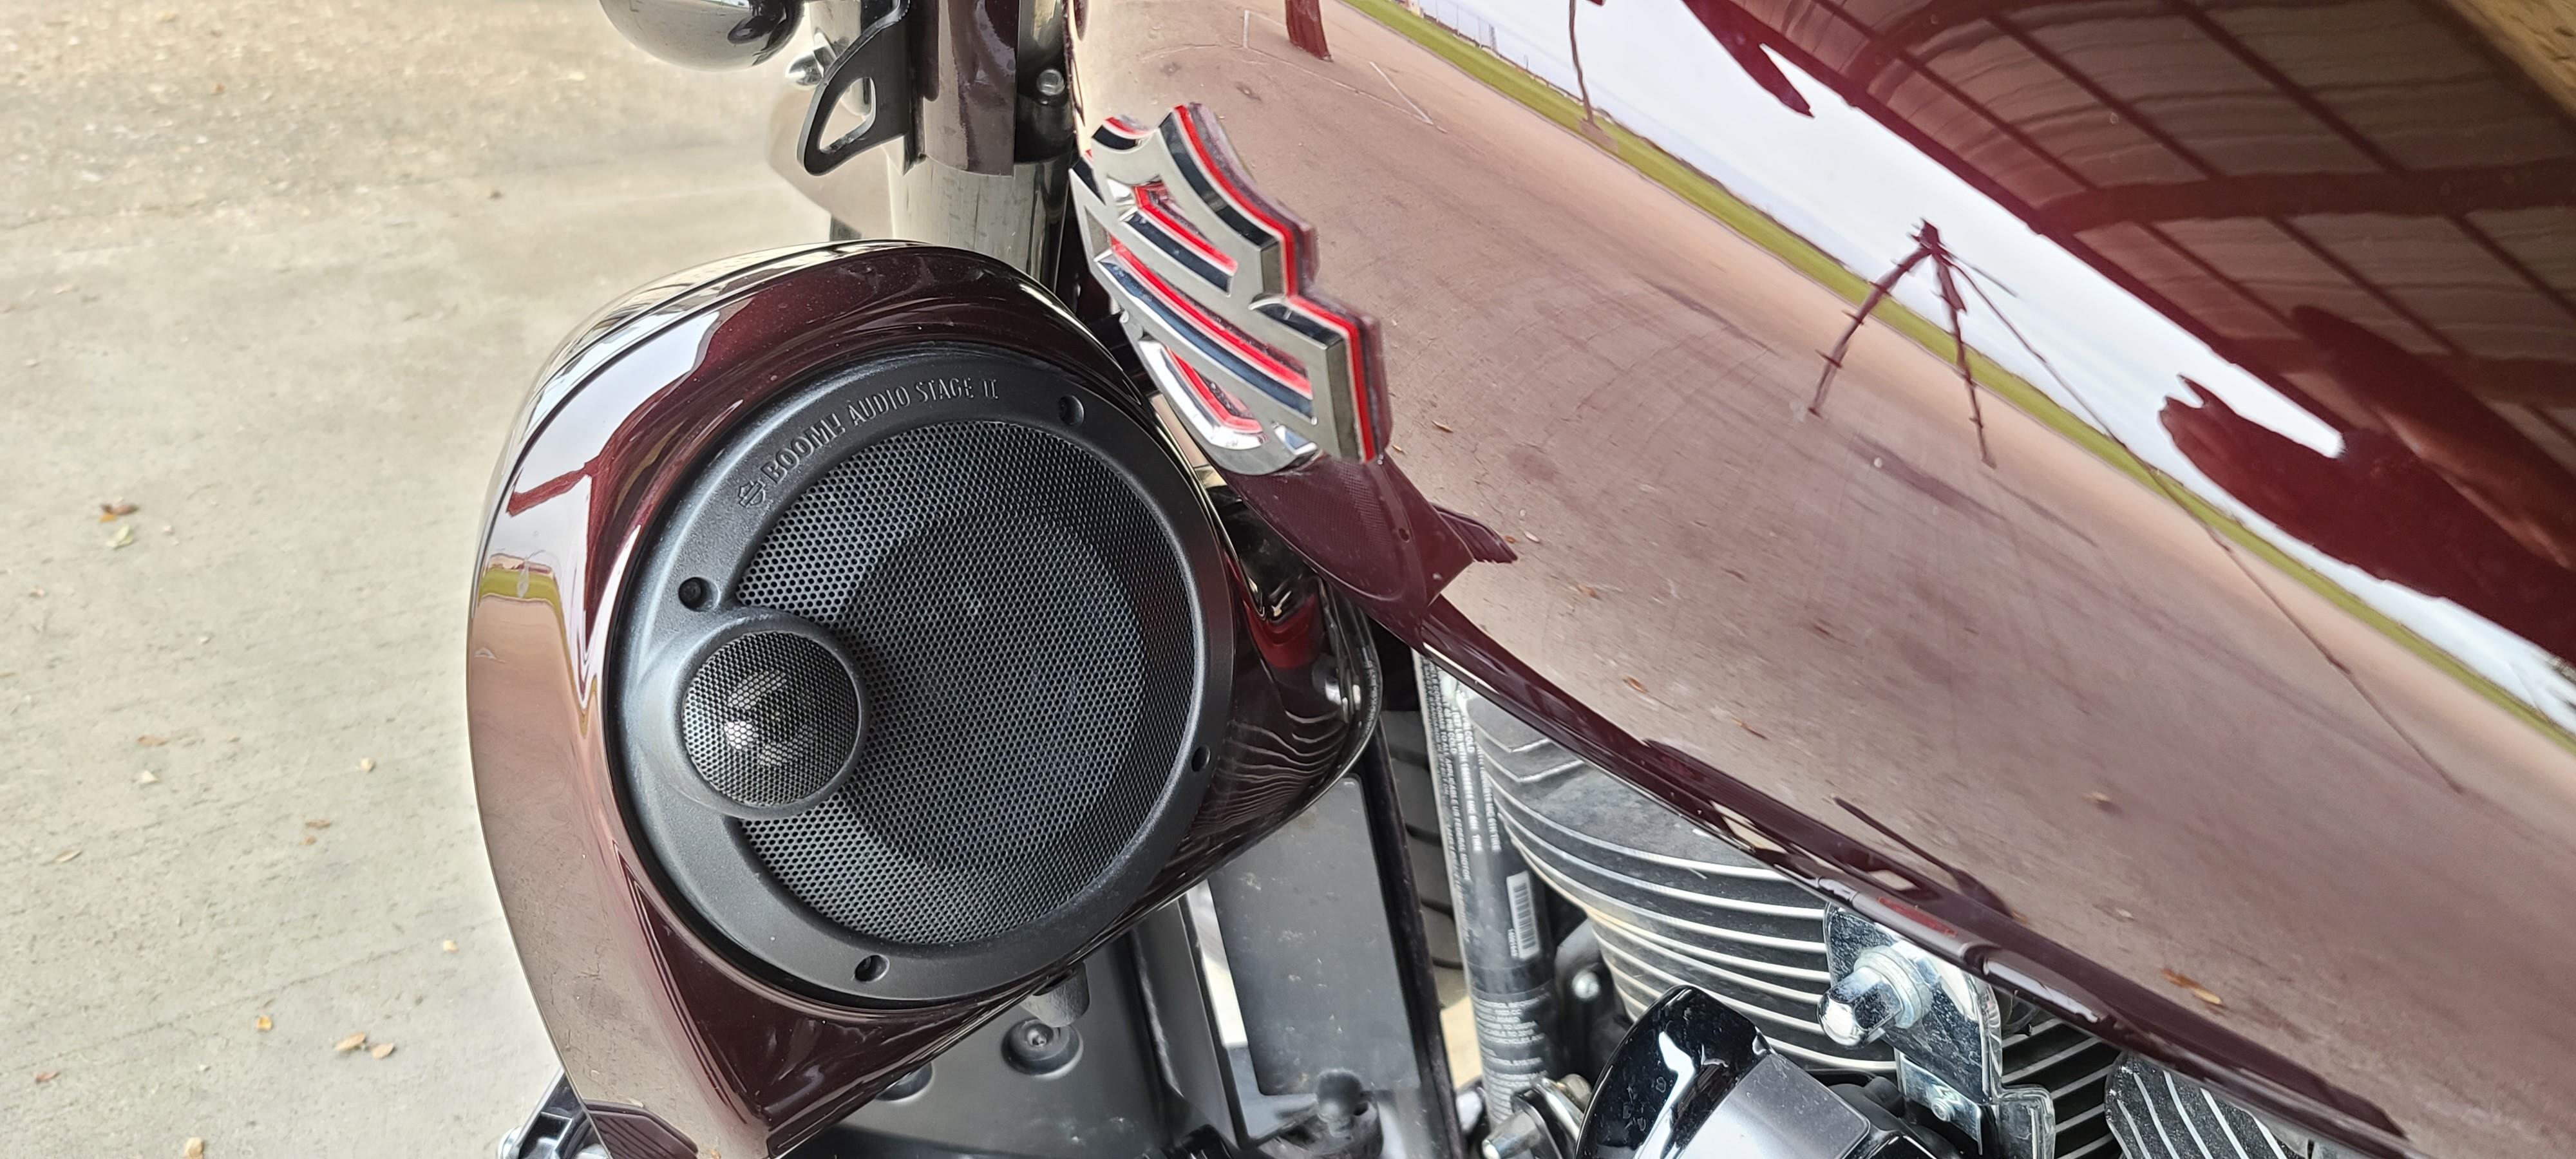 2019 Harley-Davidson Street Glide CVO Street Glide at Harley-Davidson of Waco